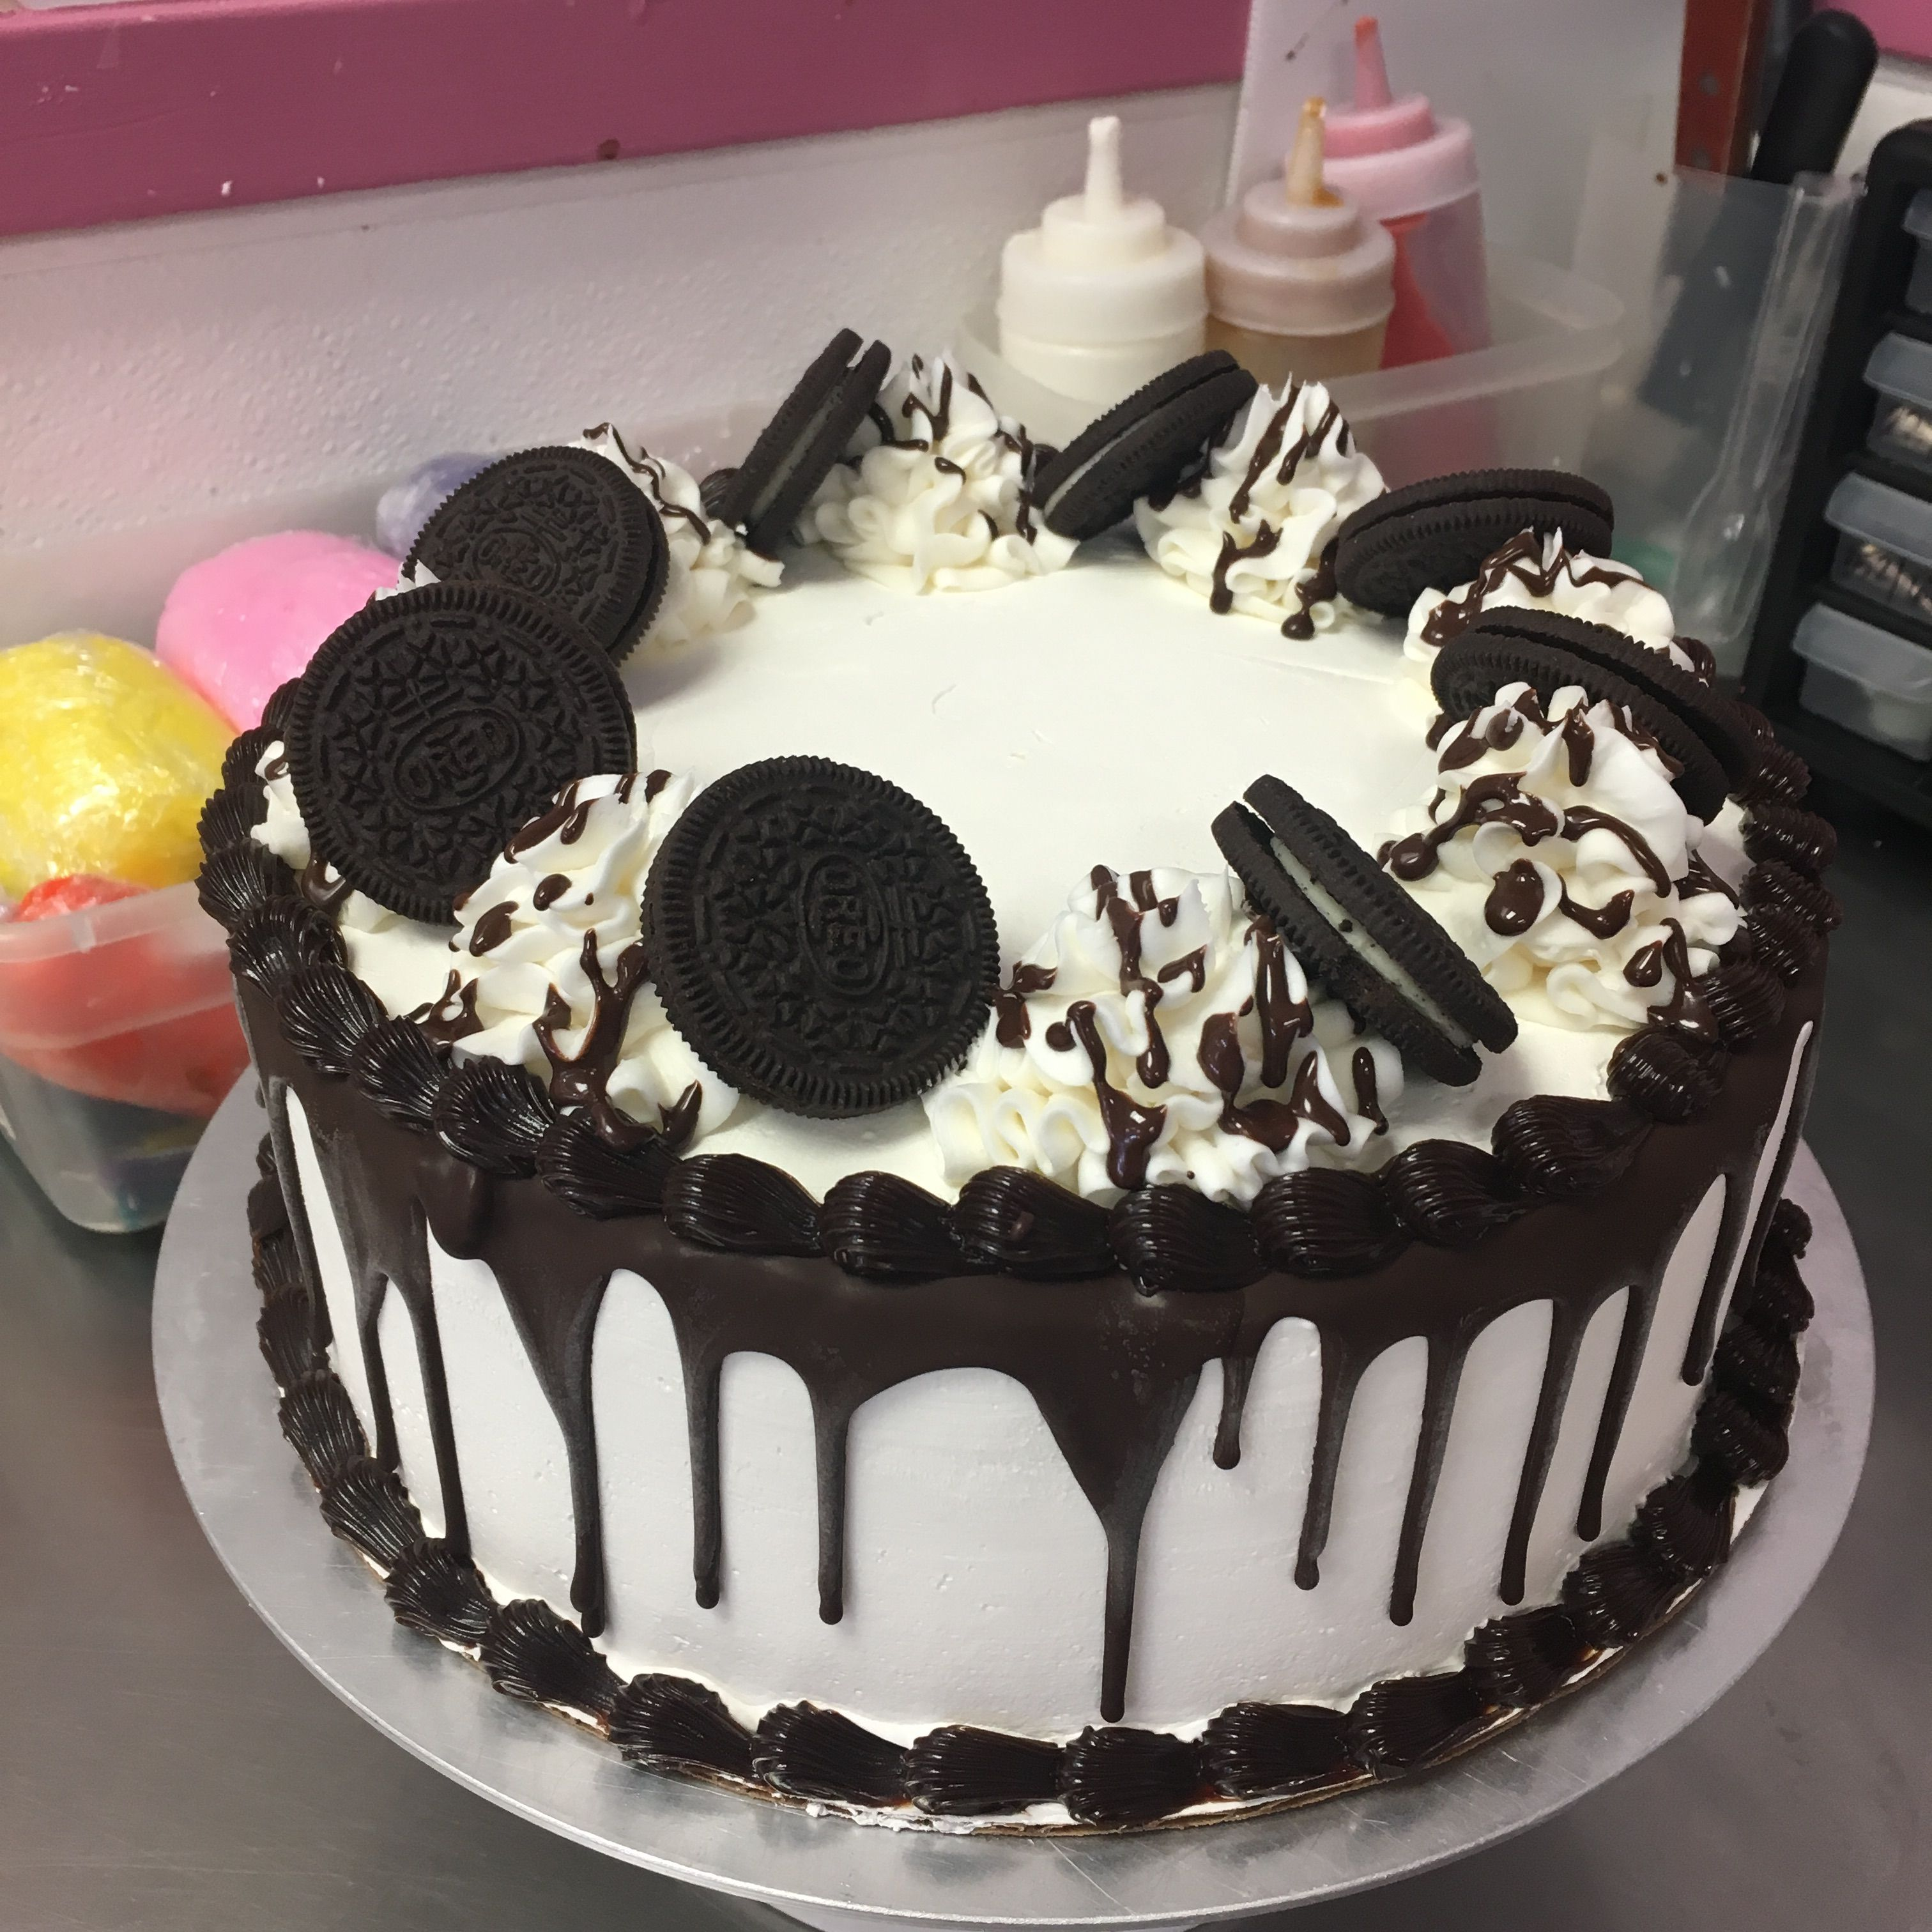 Baskin robbins oreo ice cream cake cake recipes oreo